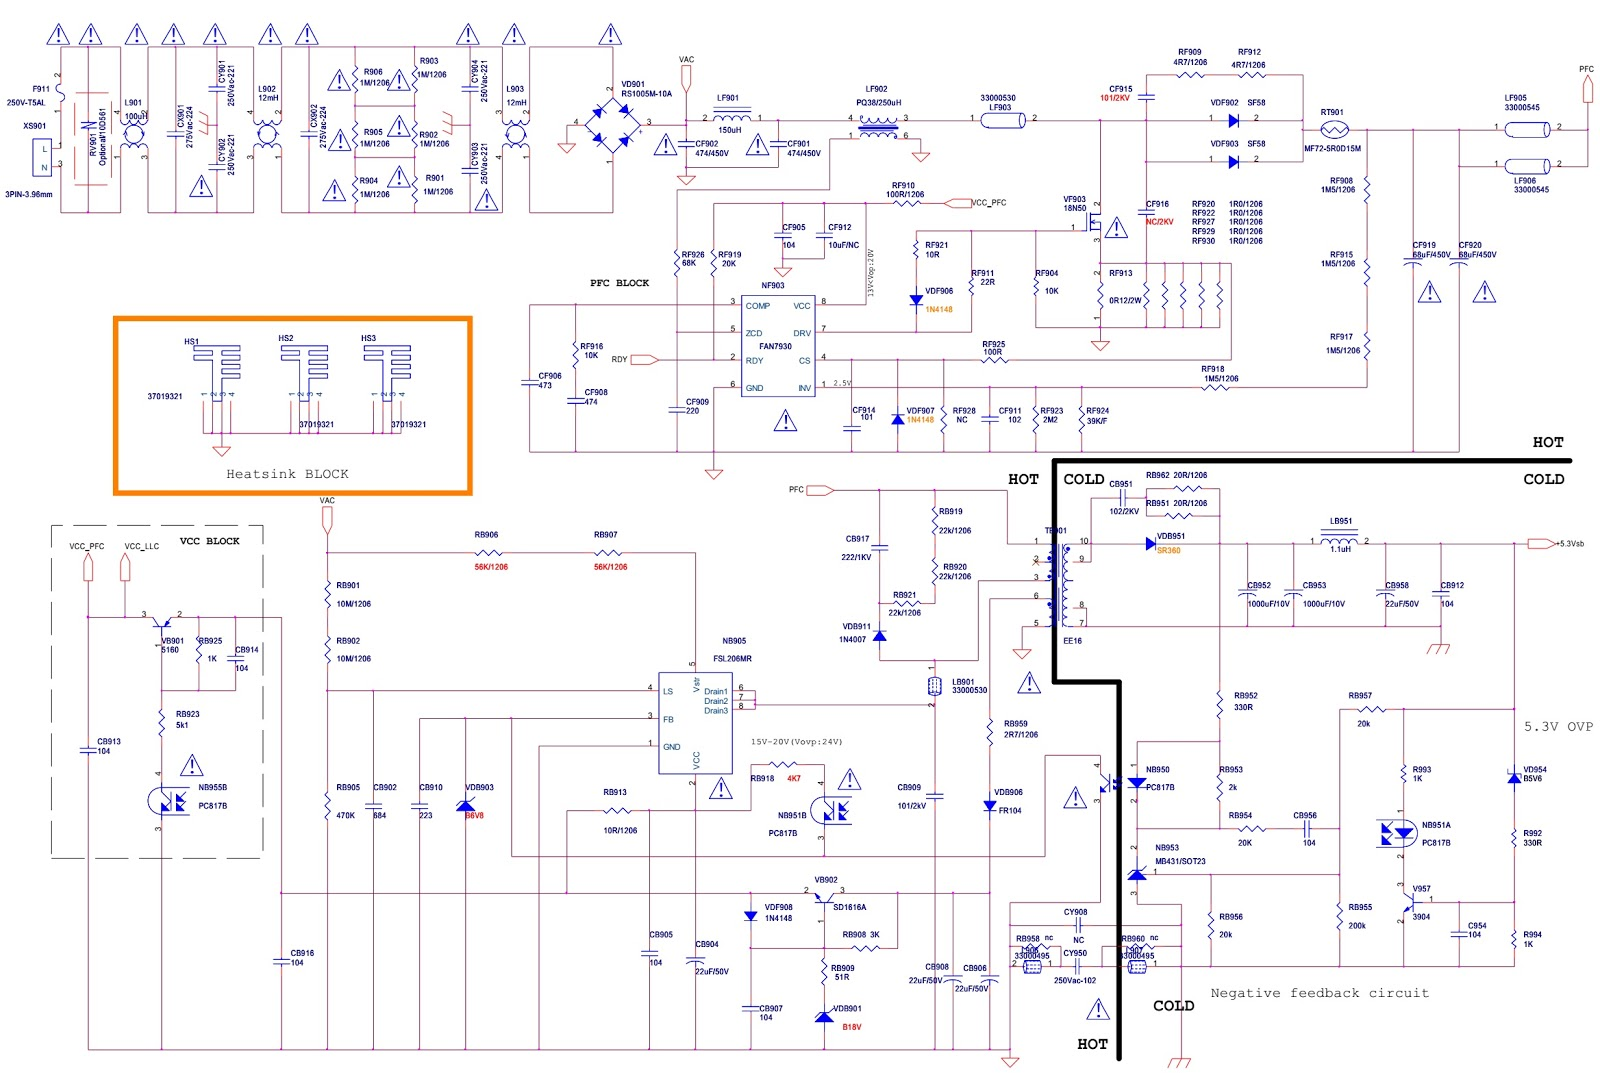 konka kip l090e02c1 01 psu lcd tv power supply inverter schematic [ 1600 x 1073 Pixel ]